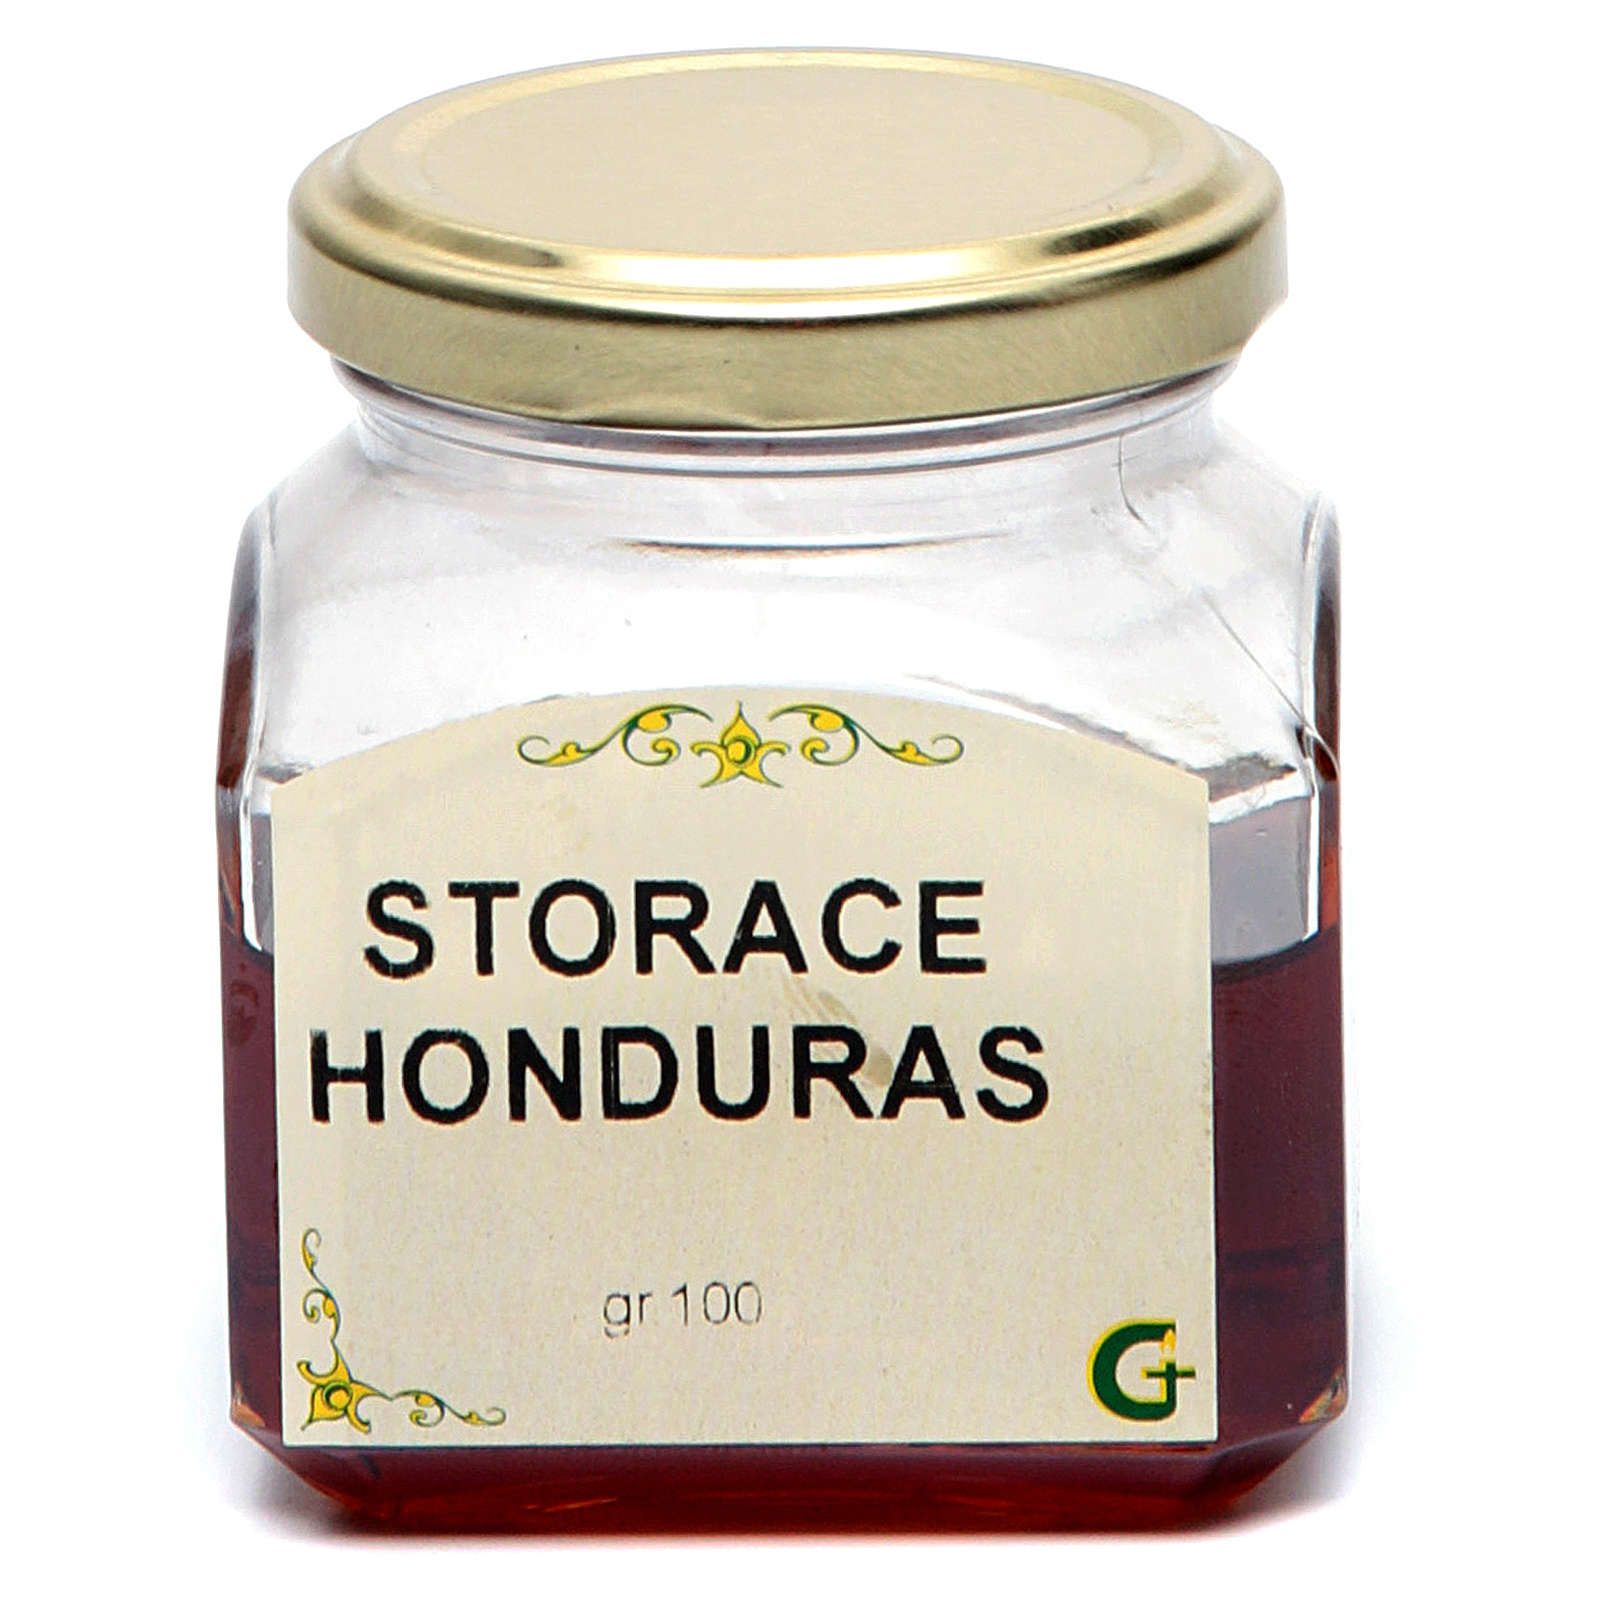 Styrax liquide Honduras 100 gr 3